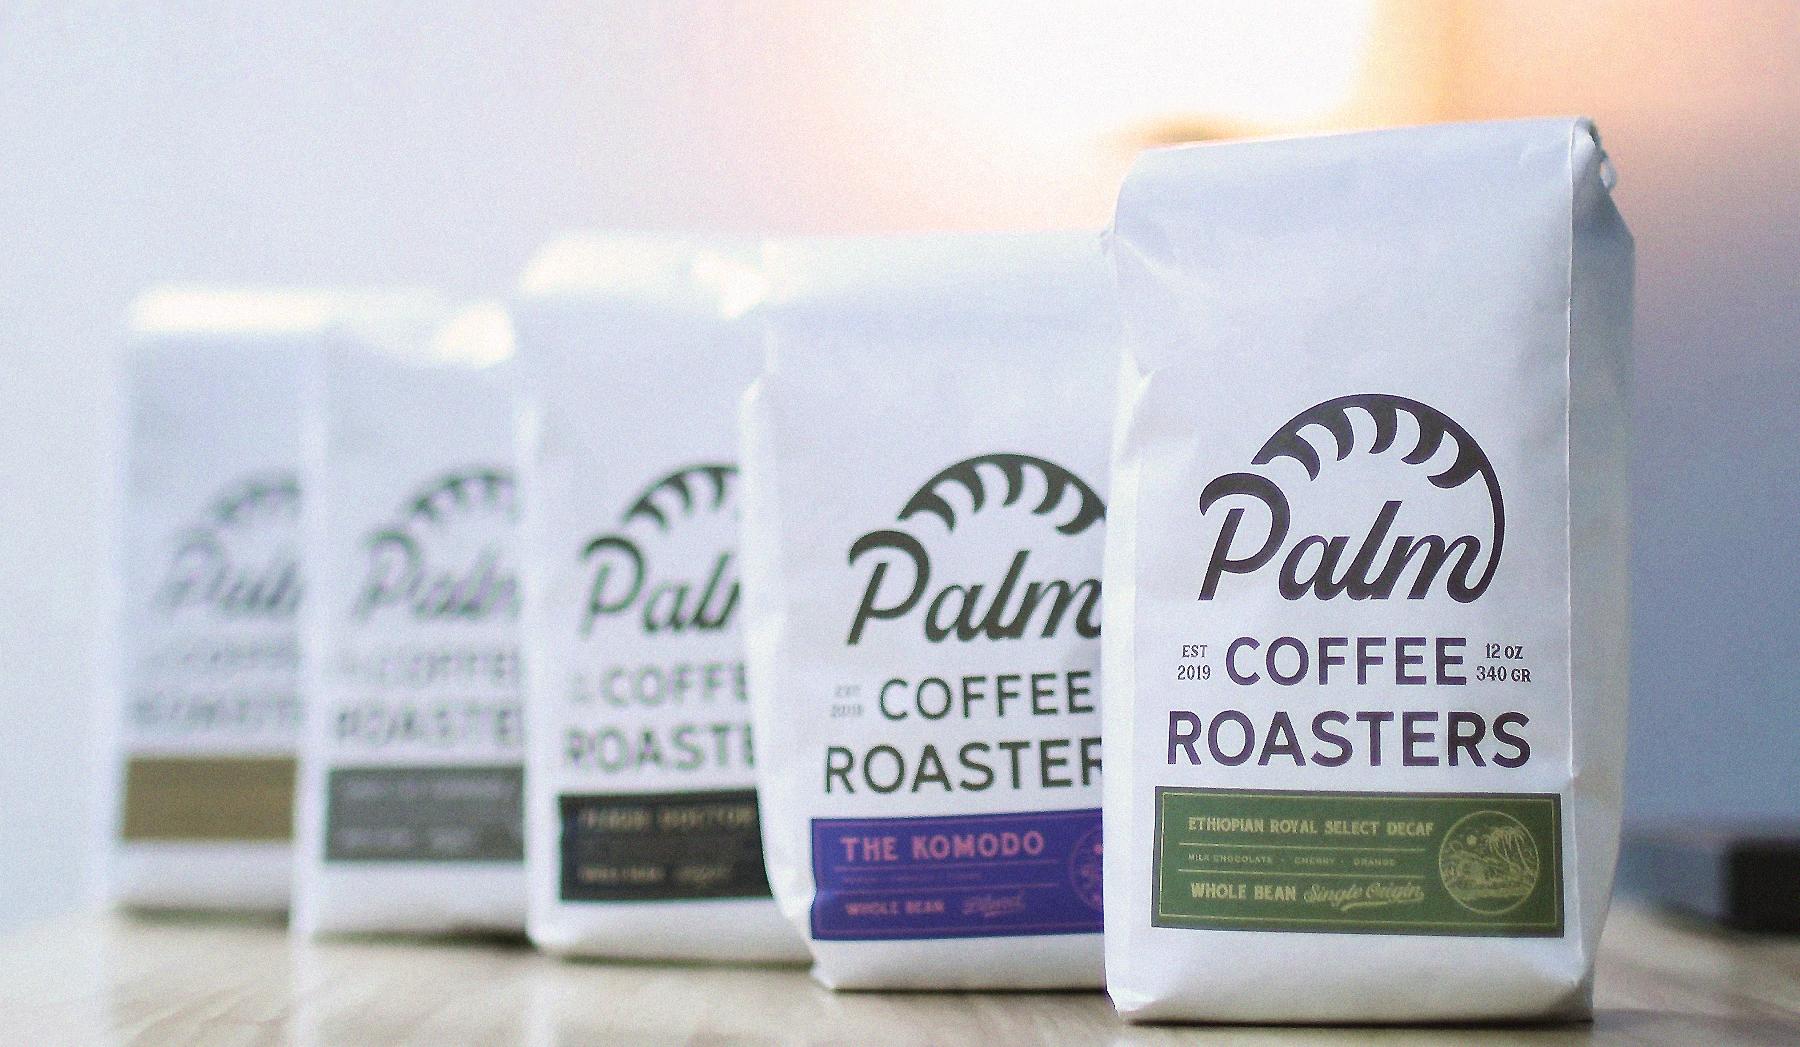 palm-coffee-zeki-michael-design-branding-freelance-packaging-artwork-agency-service-